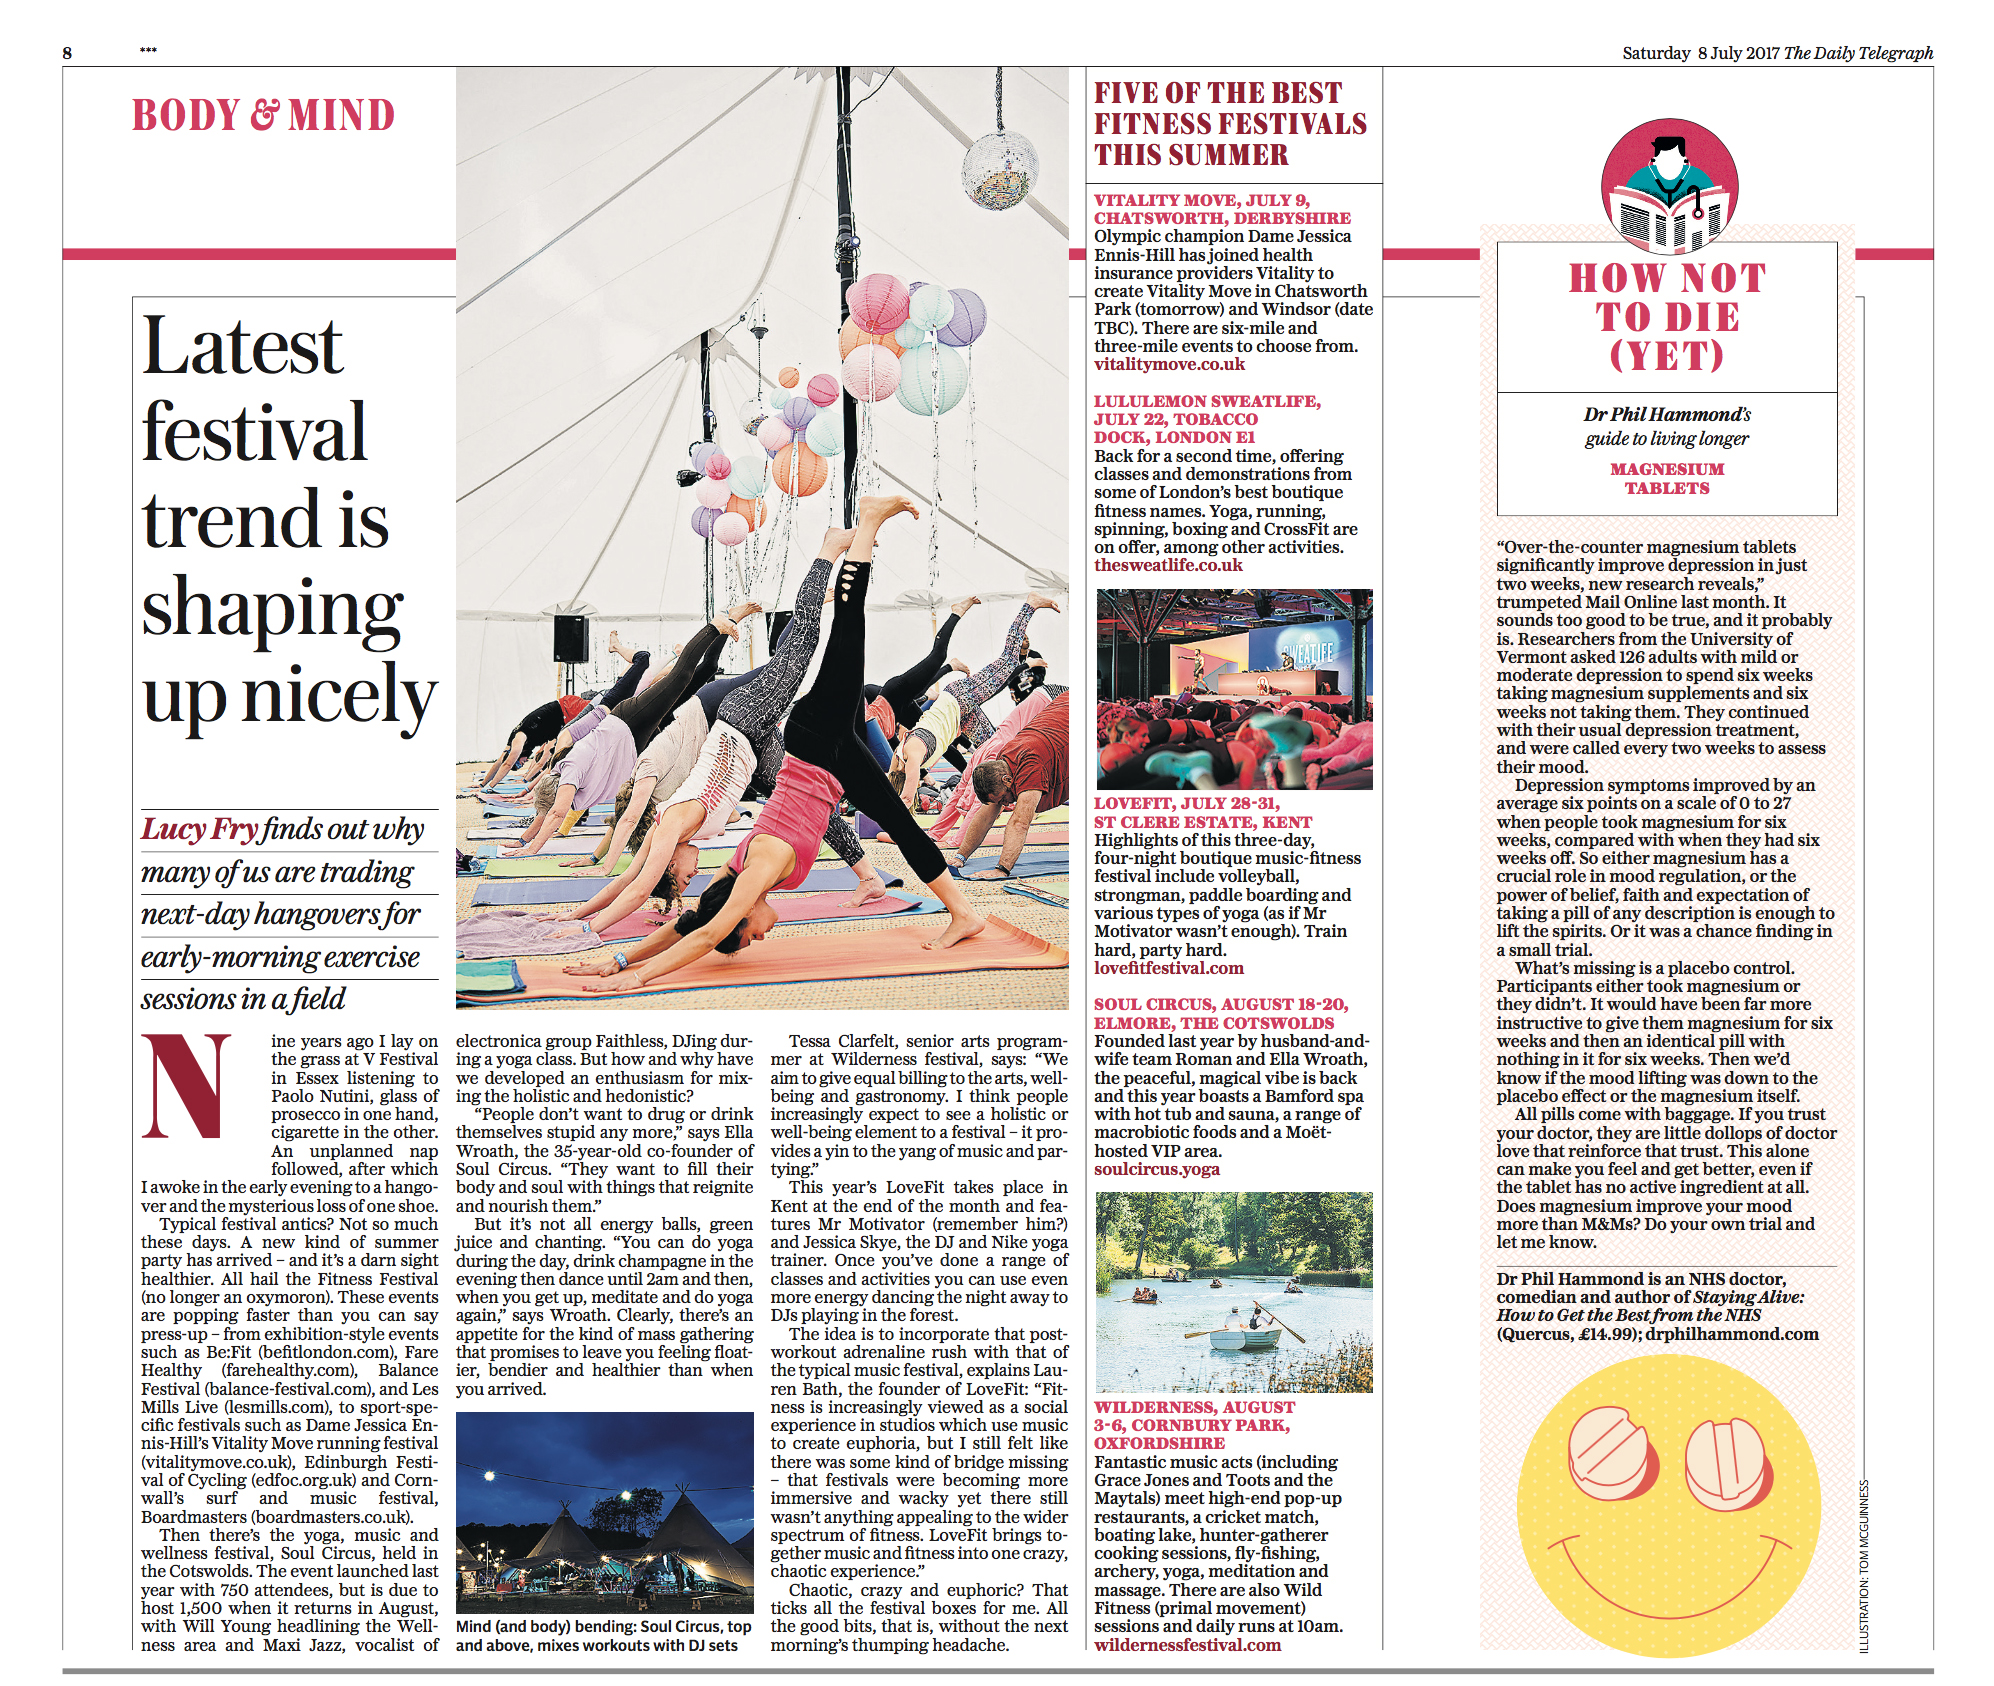 Telegraph-Lovefit.jpg